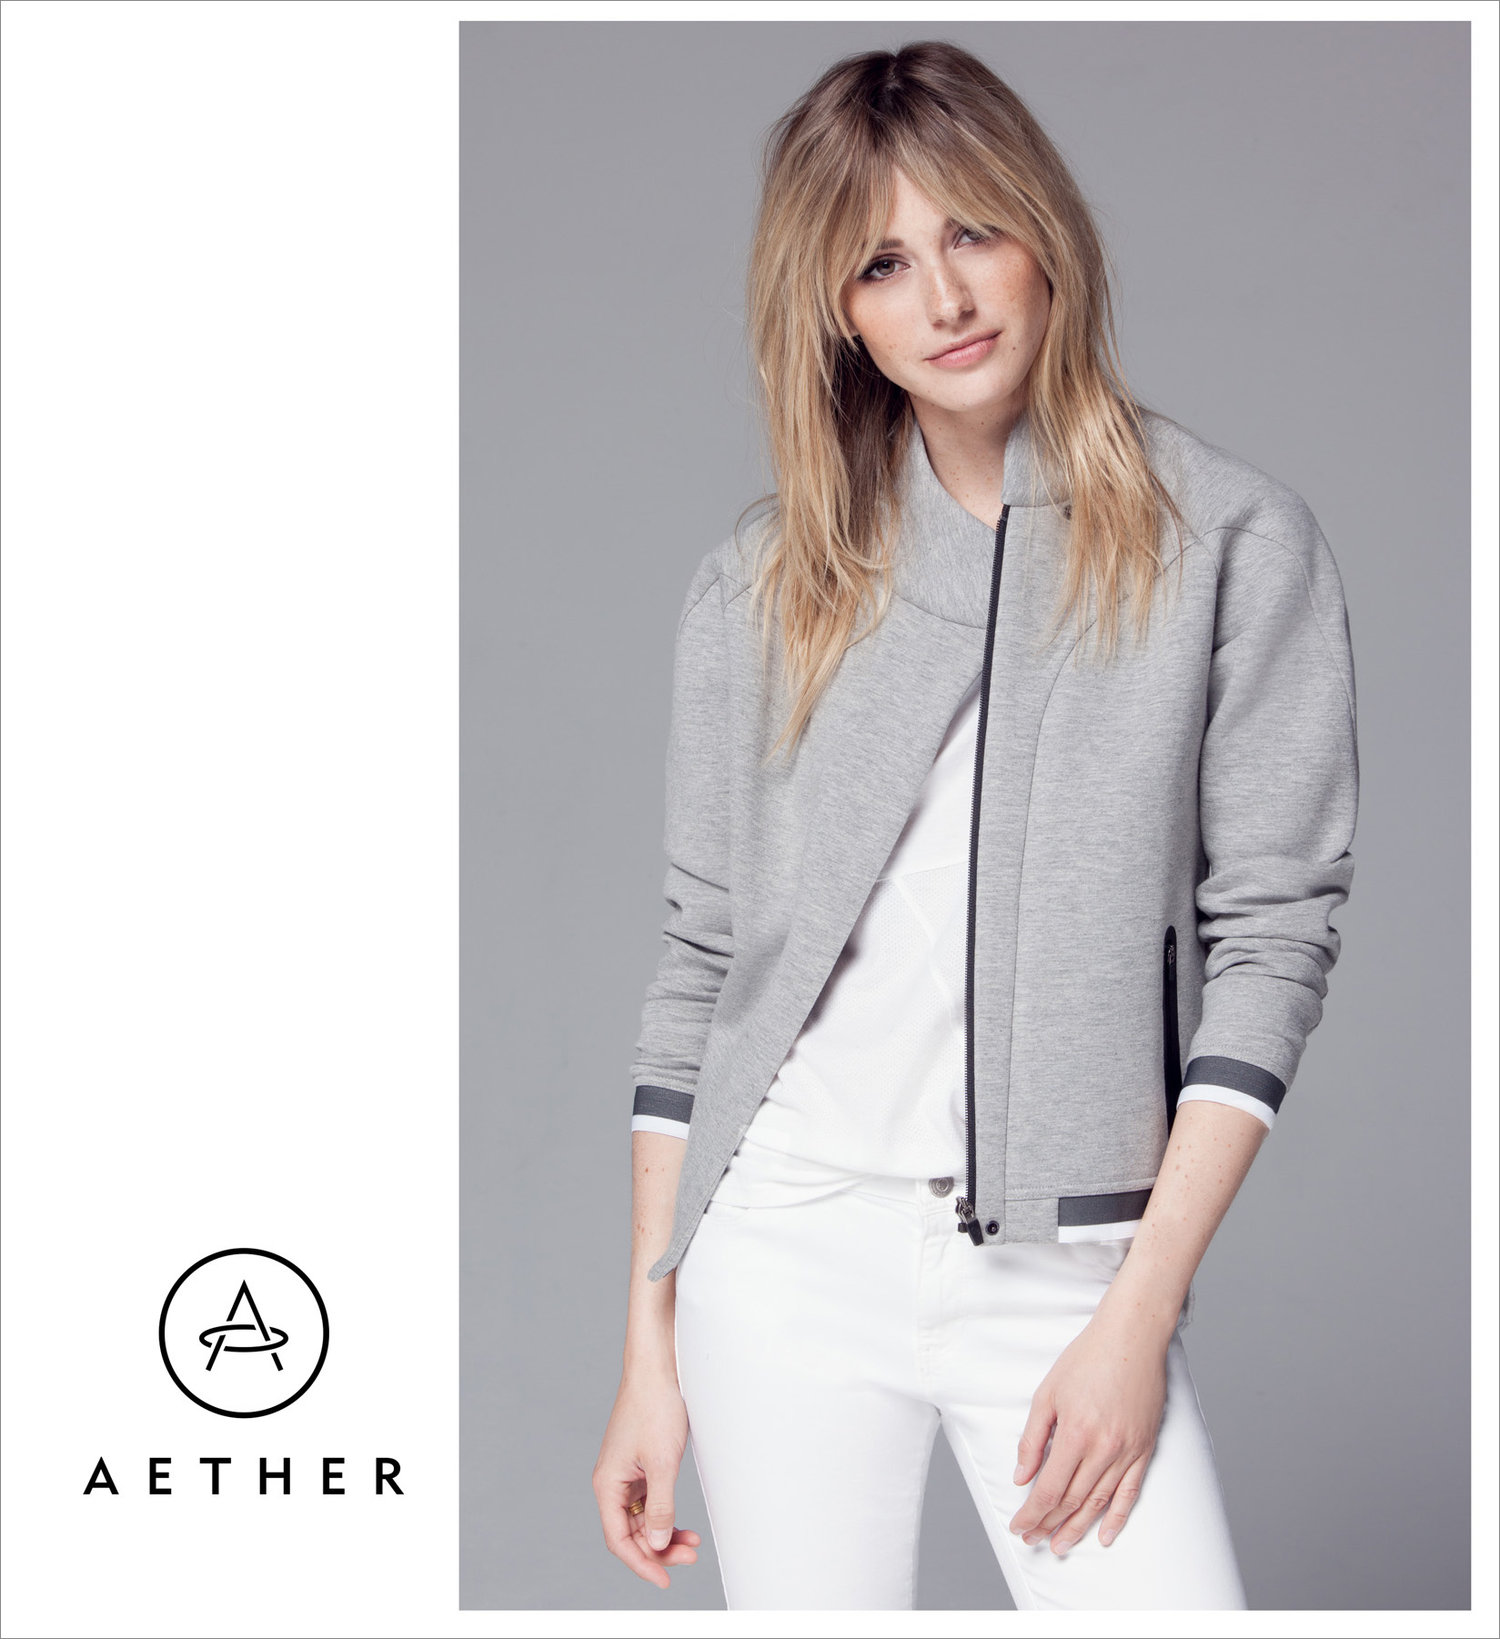 AETHER_S16_D2_QQ_3661+copy+copy.jpg